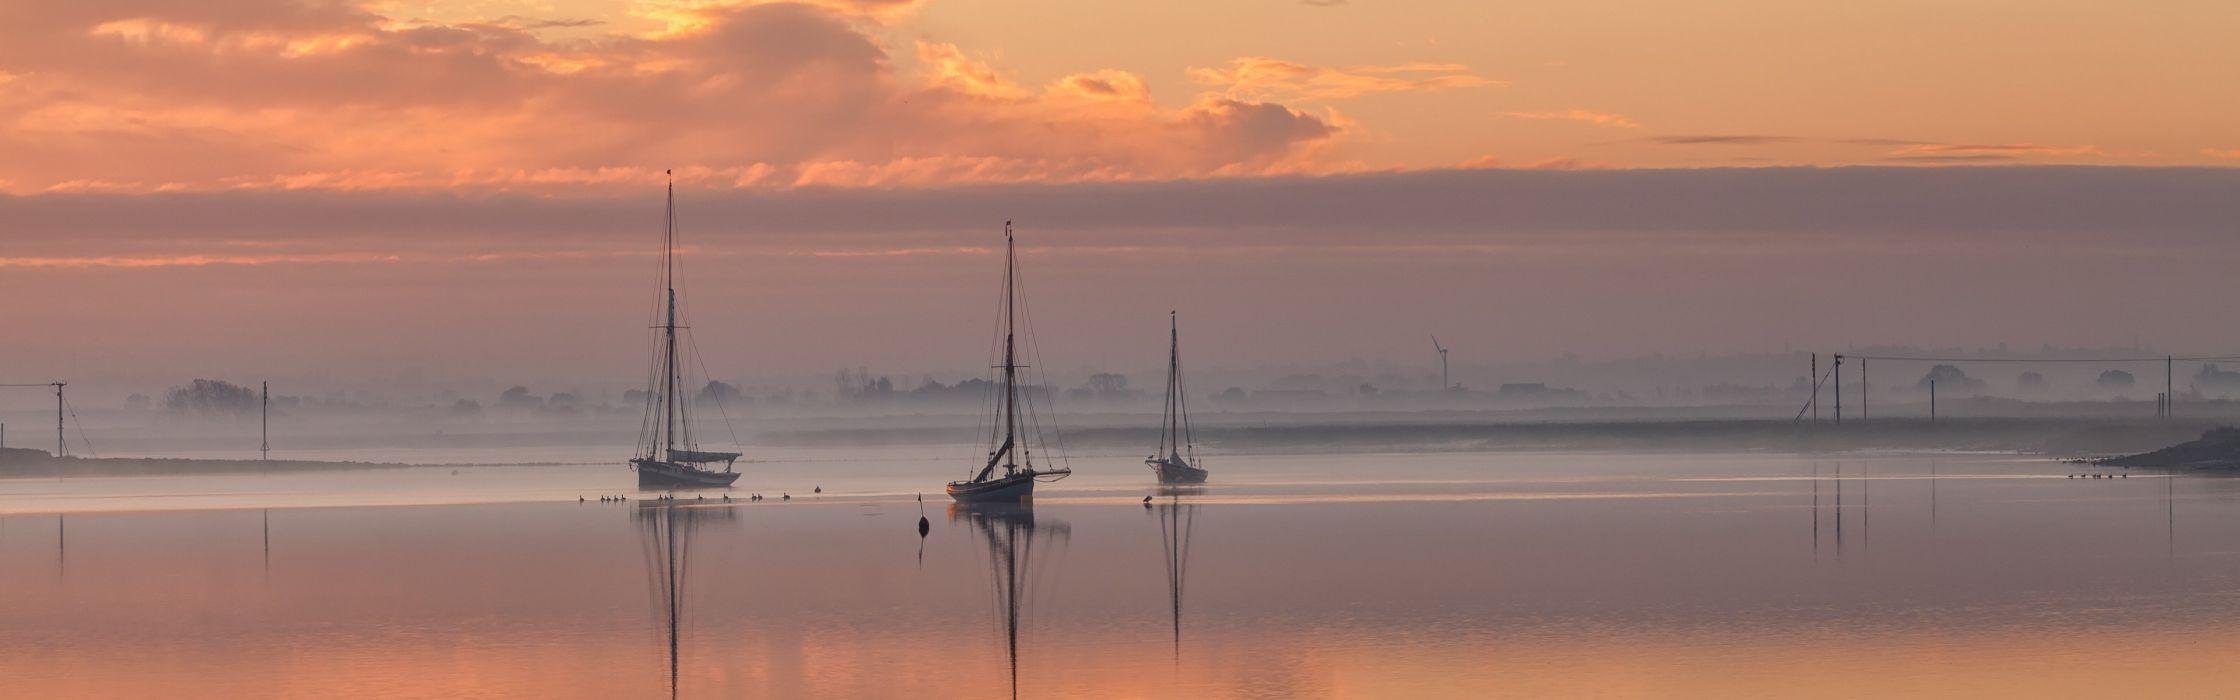 sky sea sunset night clouds boats reflection fog mist wallpaper